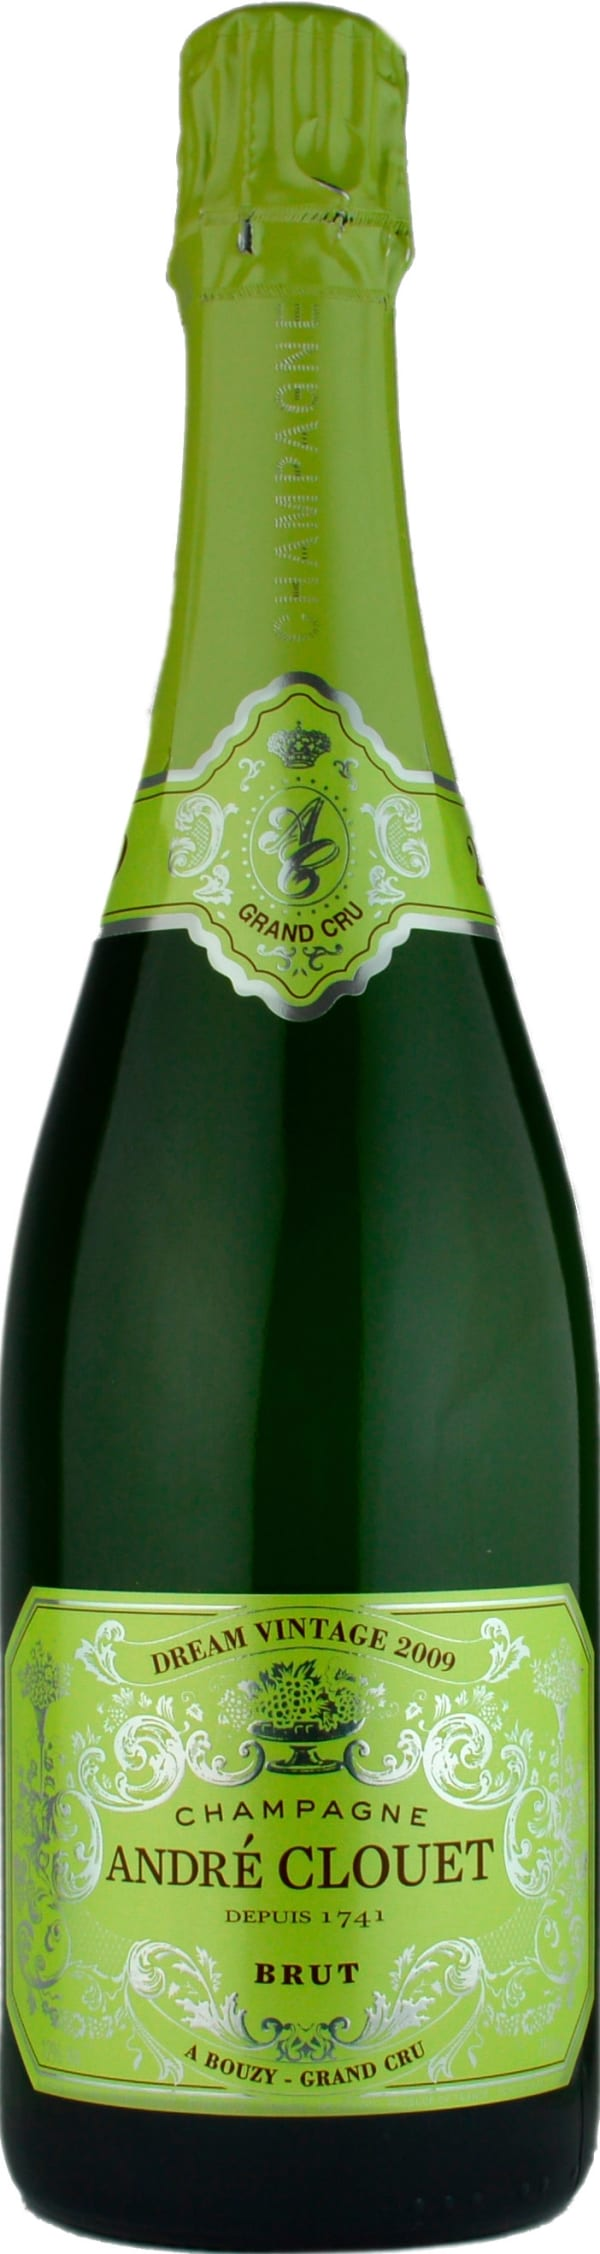 André Clouet Dream Vintage Grand Cru Champagne Brut 2006